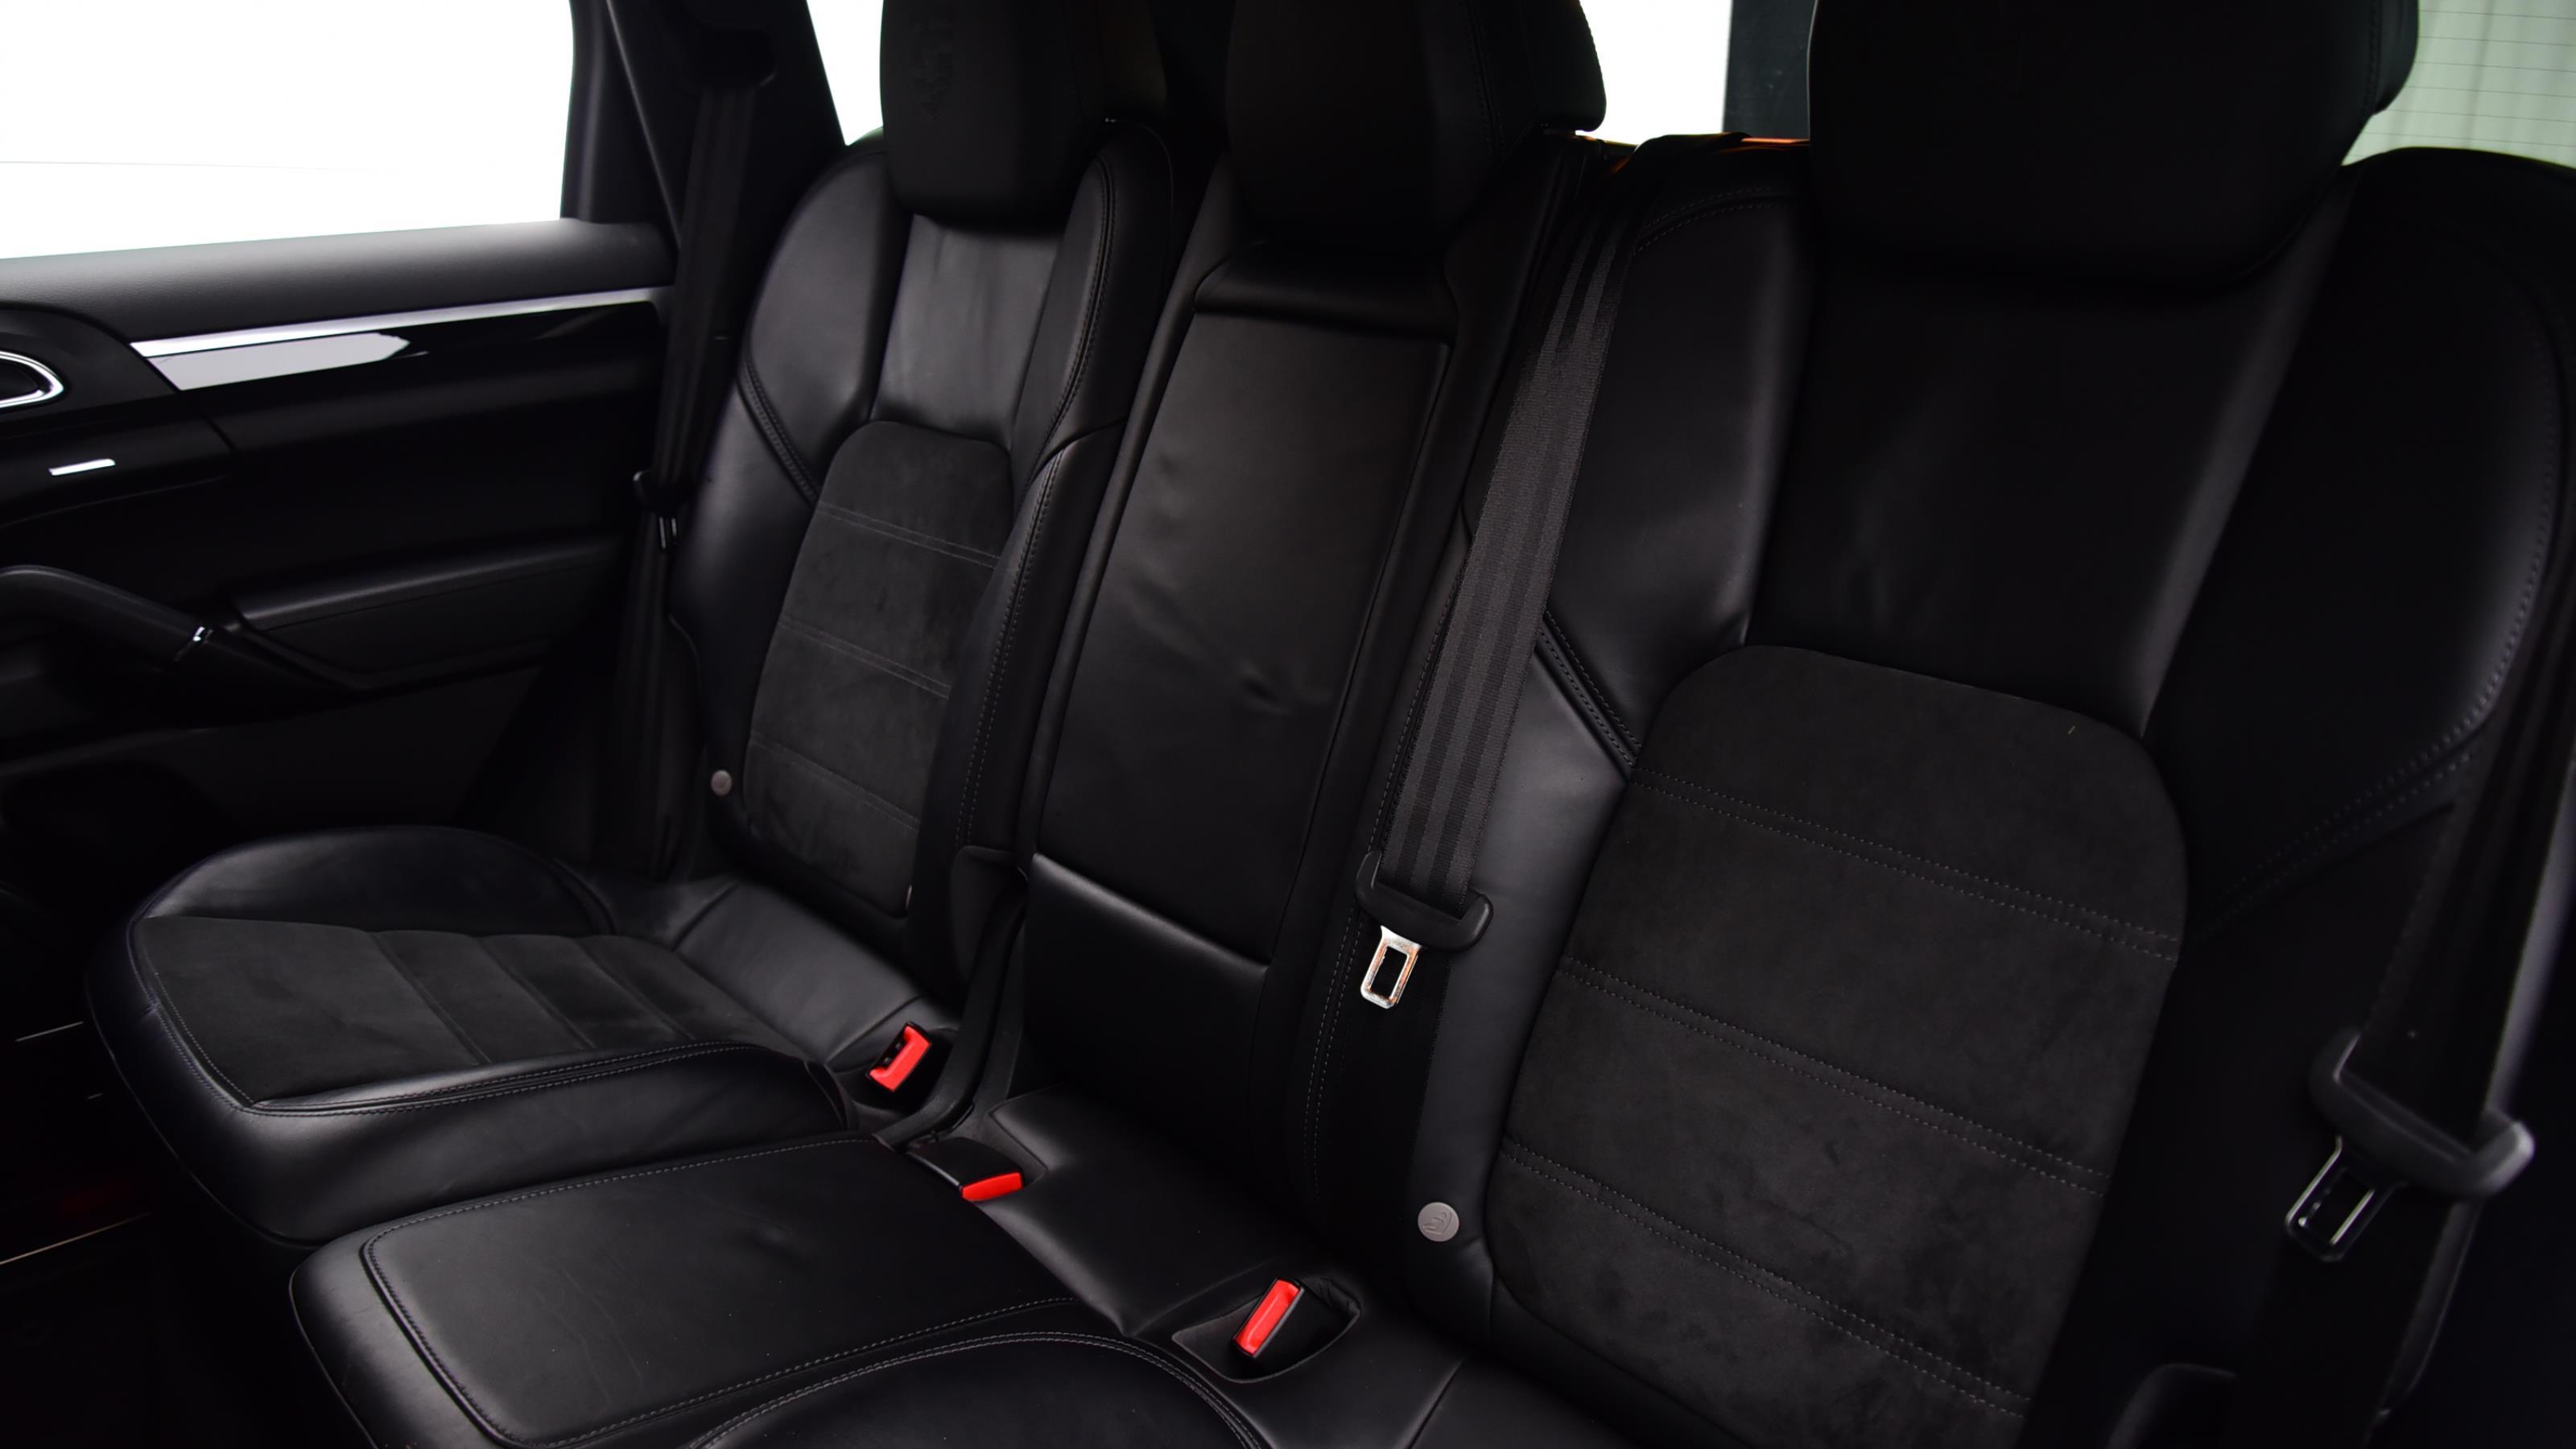 Used 2016 Porsche CAYENNE Platinum Edition Diesel 5dr Tiptronic S BLACK at Saxton4x4